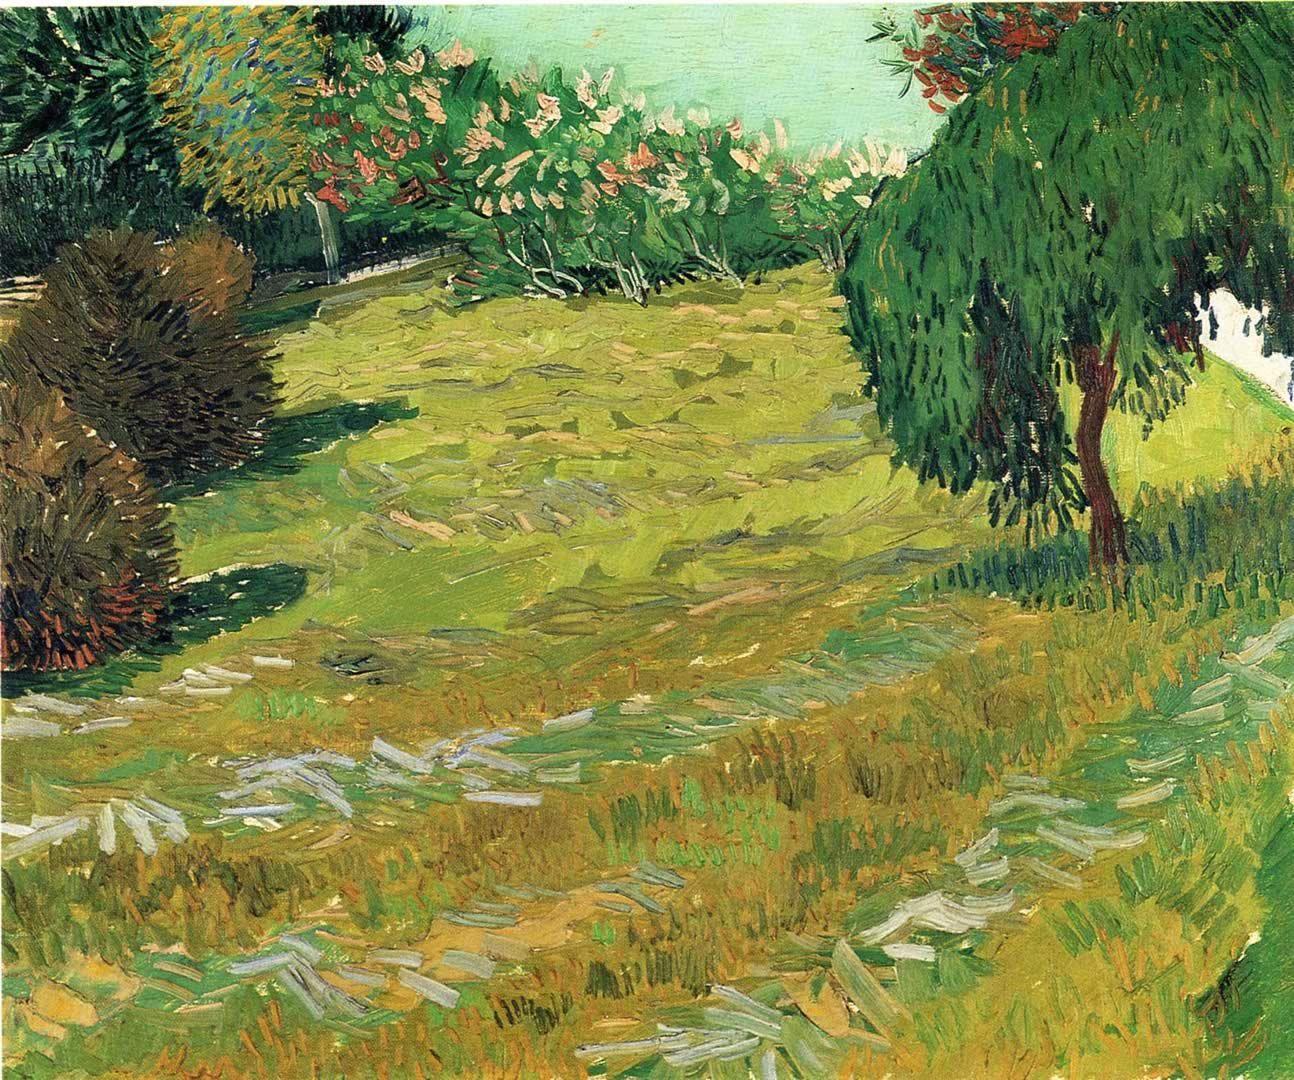 Sunny Lawn in a Public Park. Van Gogh. July 1888. Arles. Oil on ...